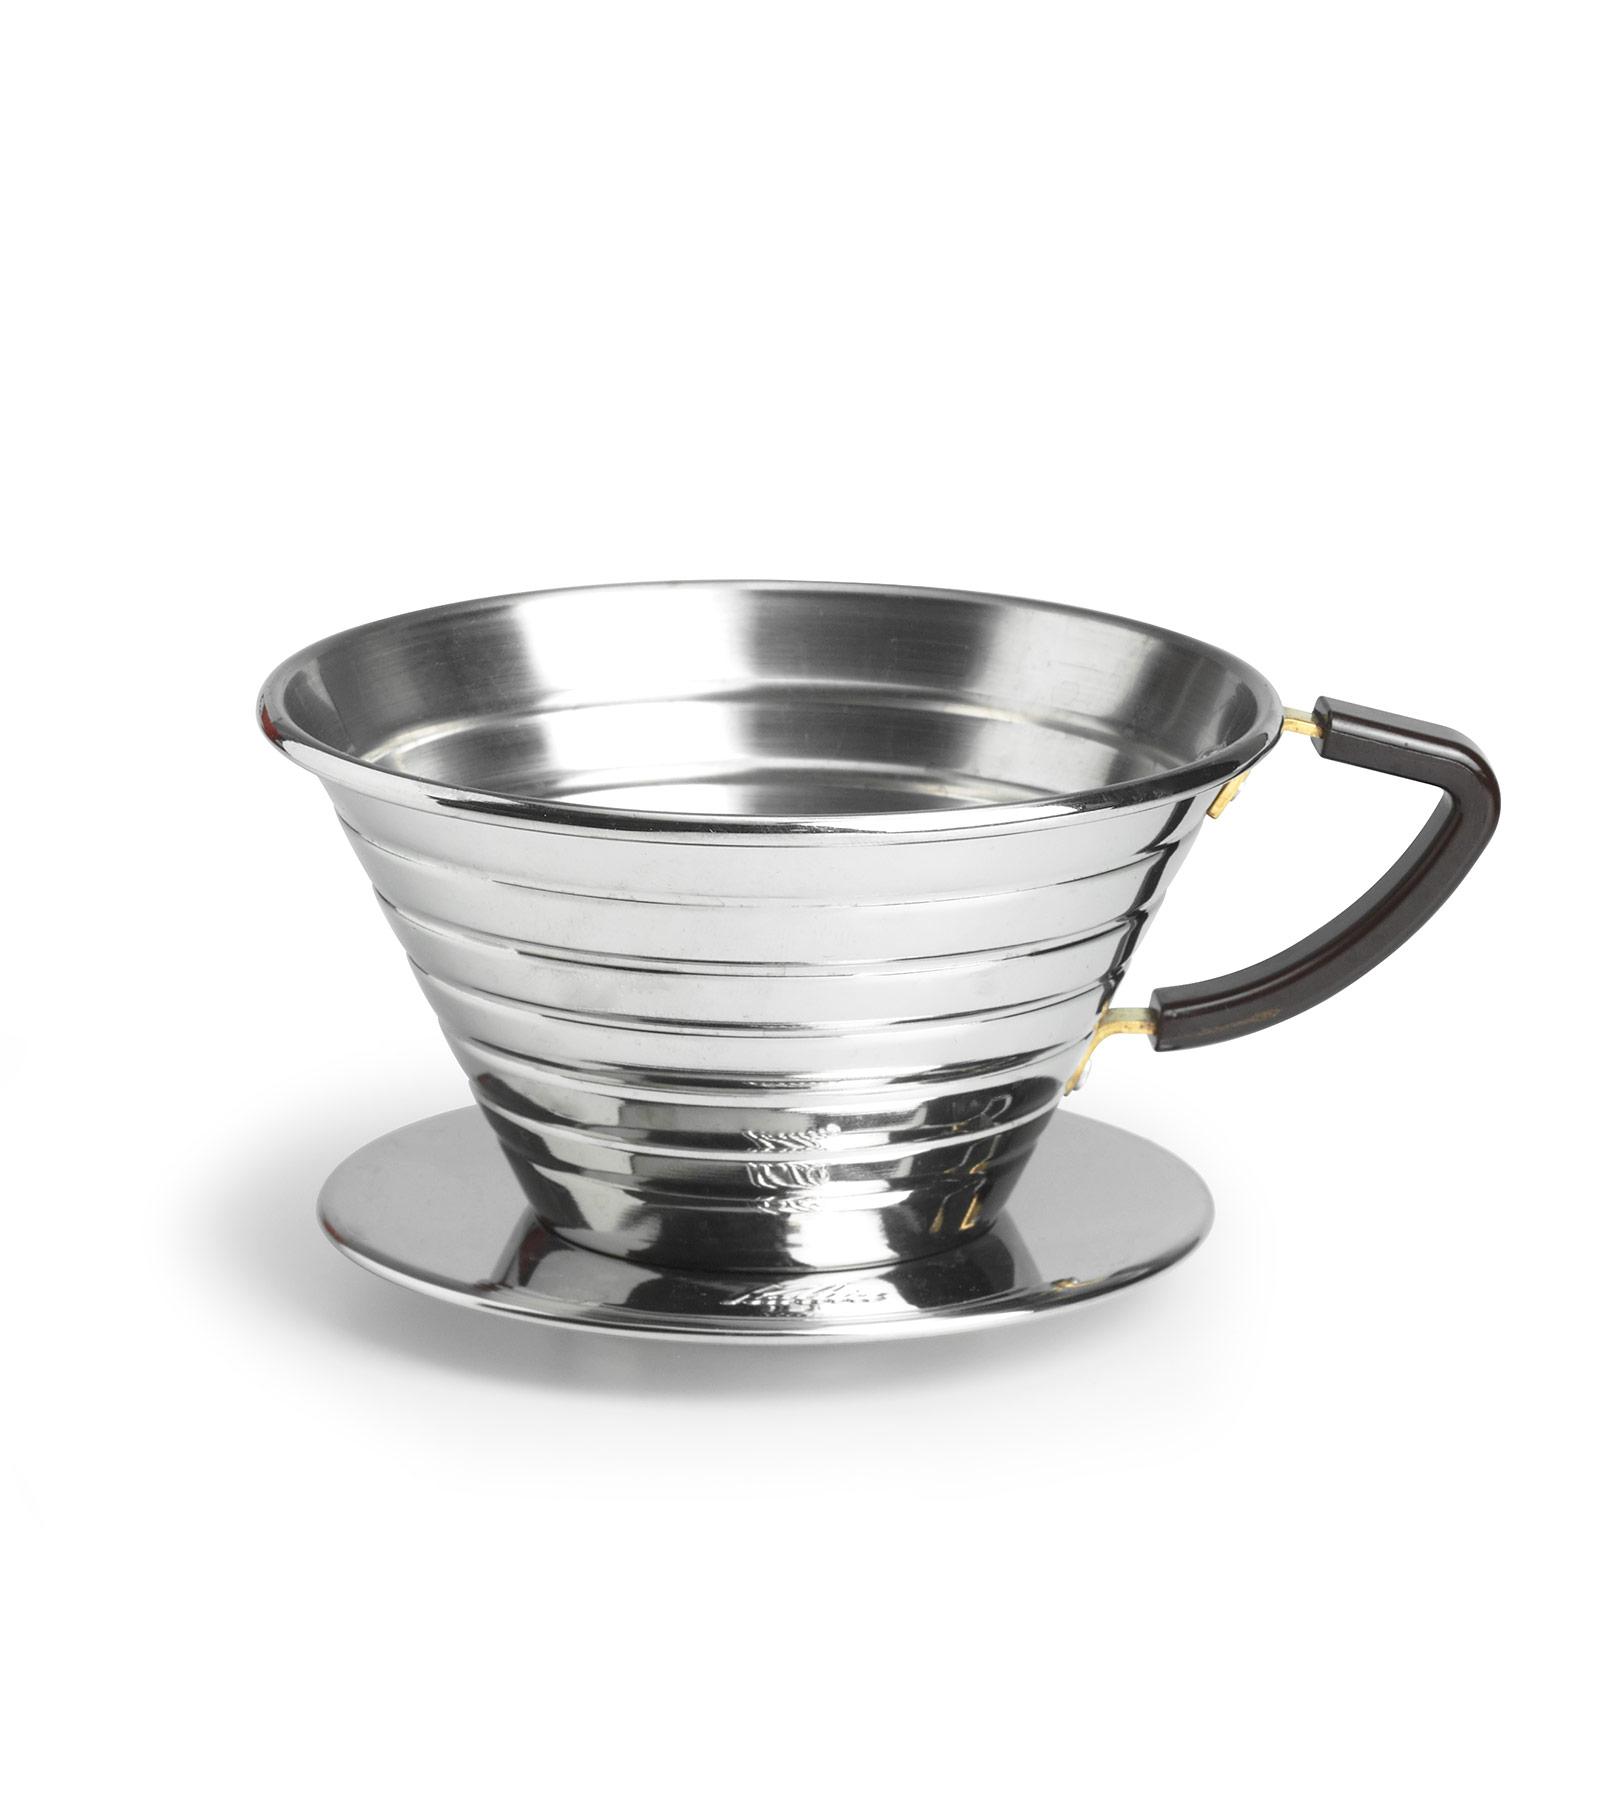 Kalita ถ้วยกาแฟดริป รุ่น 185 dripper stainless steel ขนาด 1-4 cups